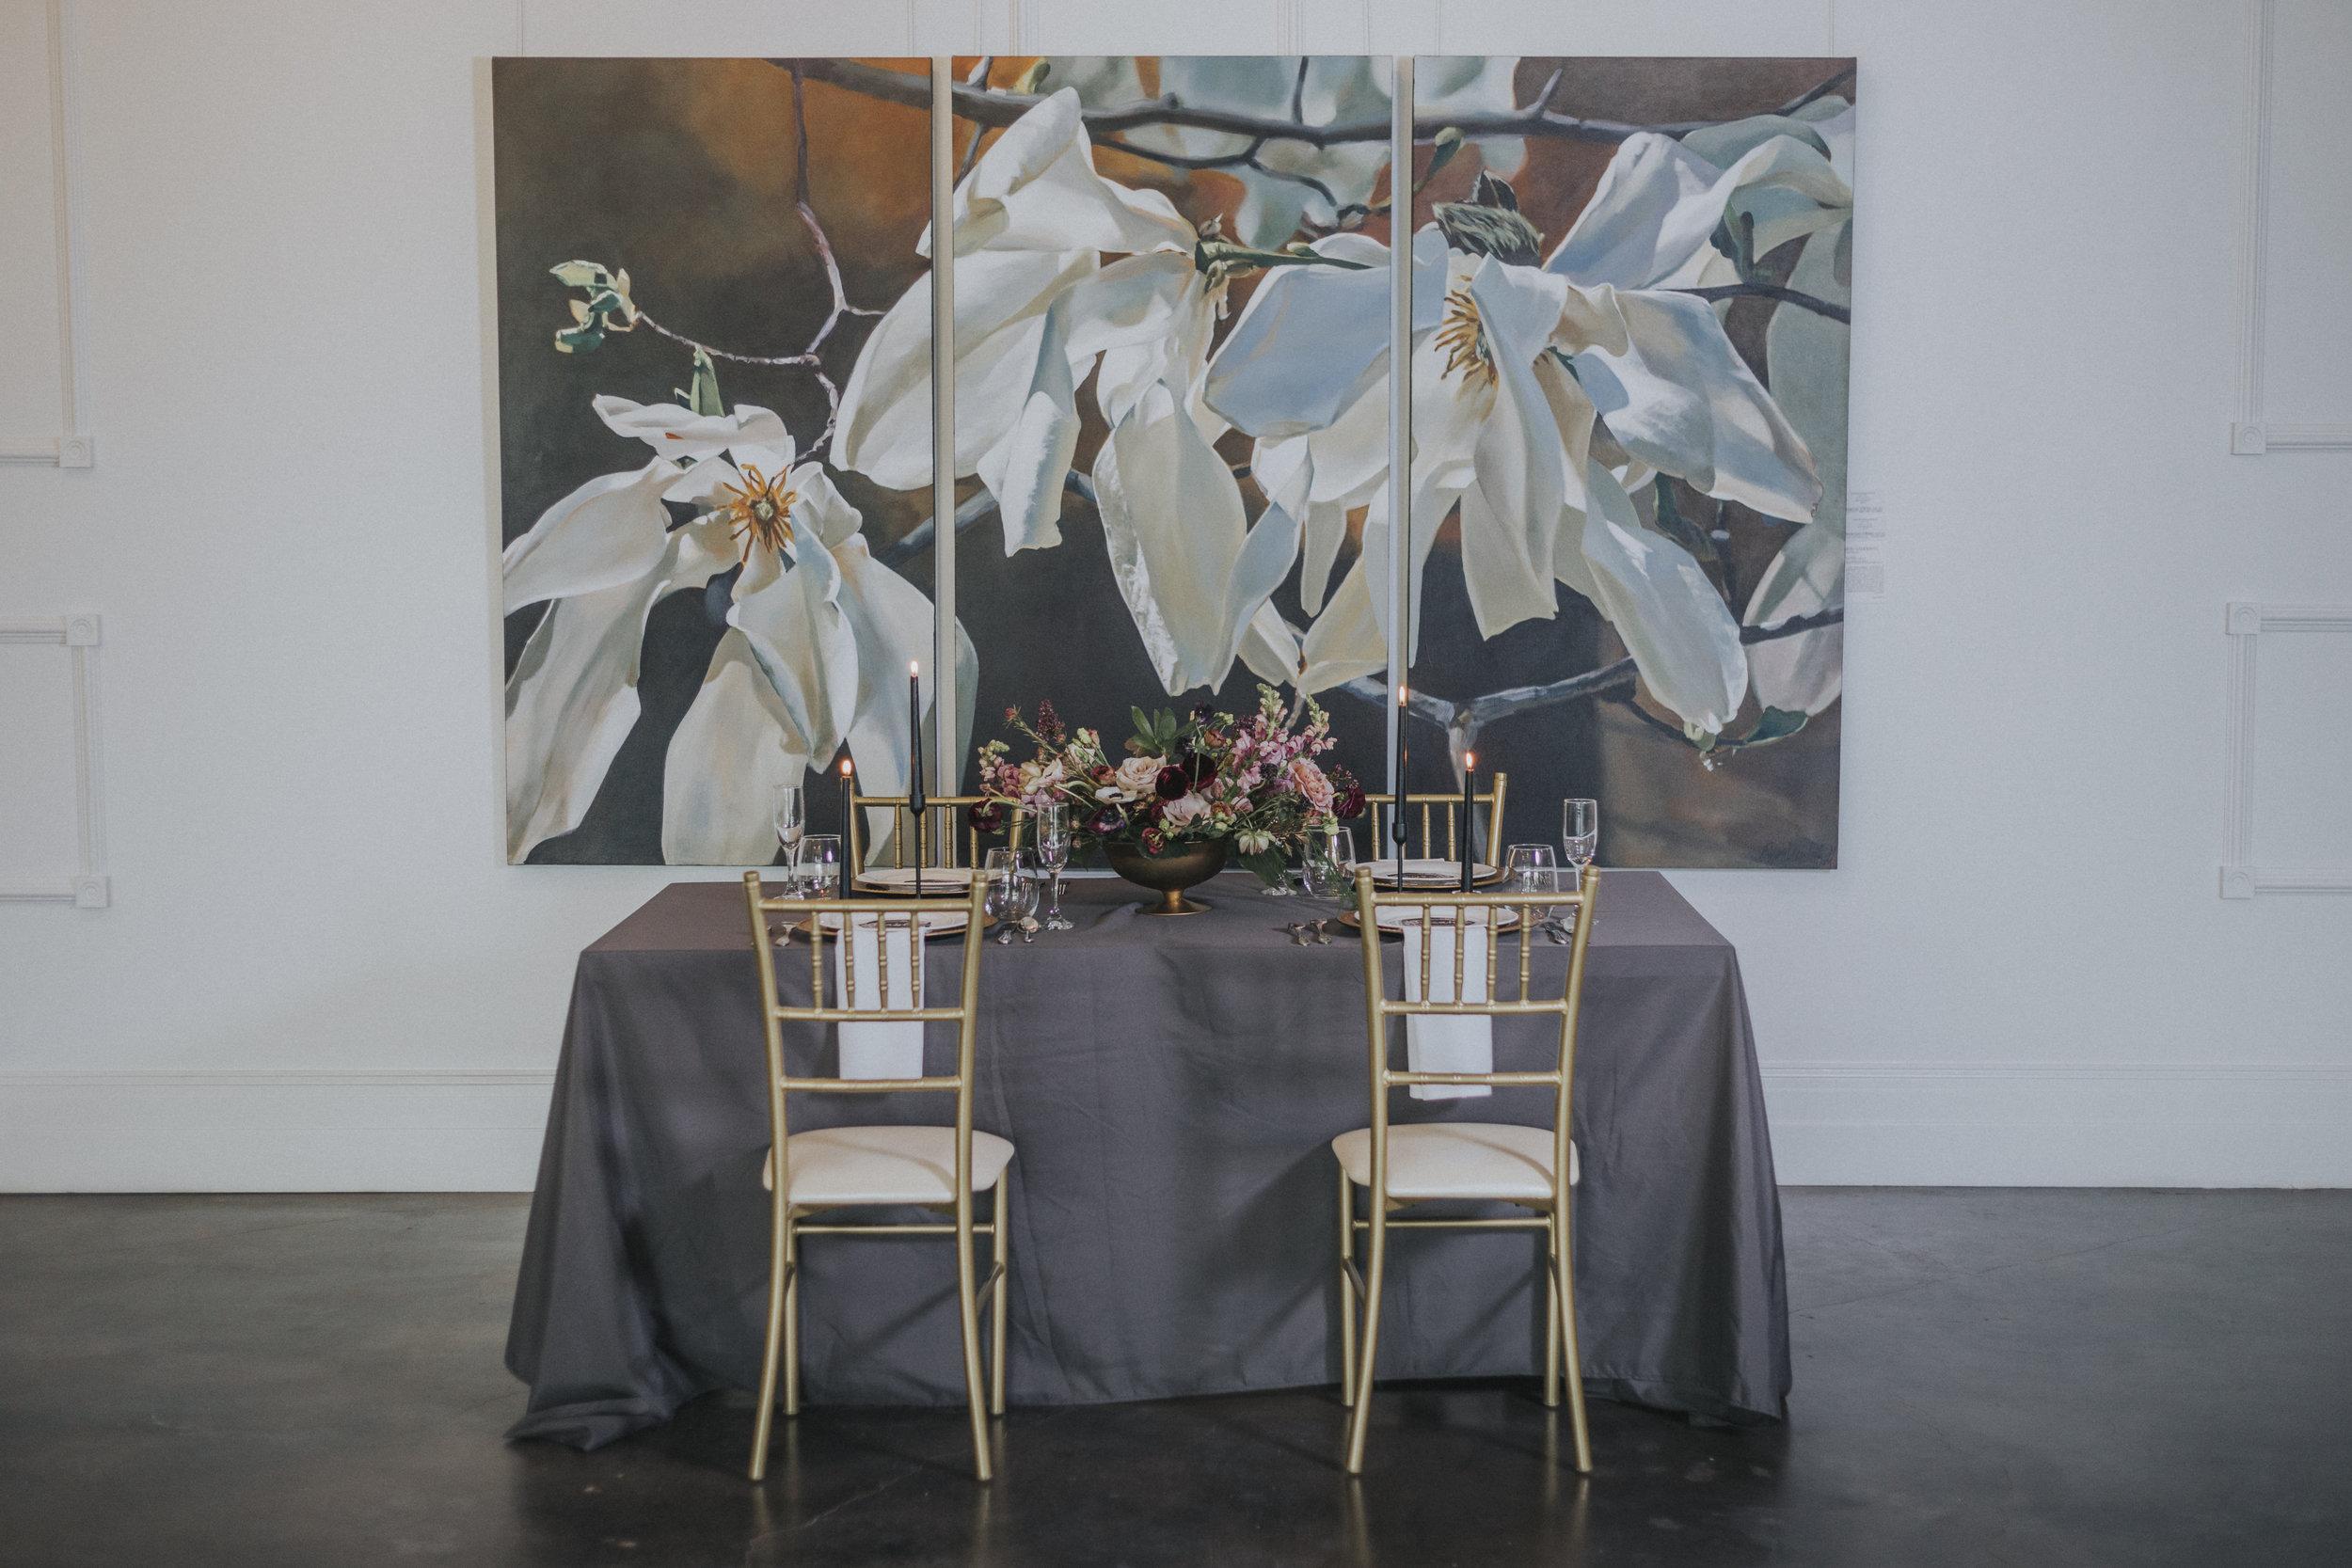 81  omaha-nebraska-empire-room-tiny-luxe-wedding-planner.jpg